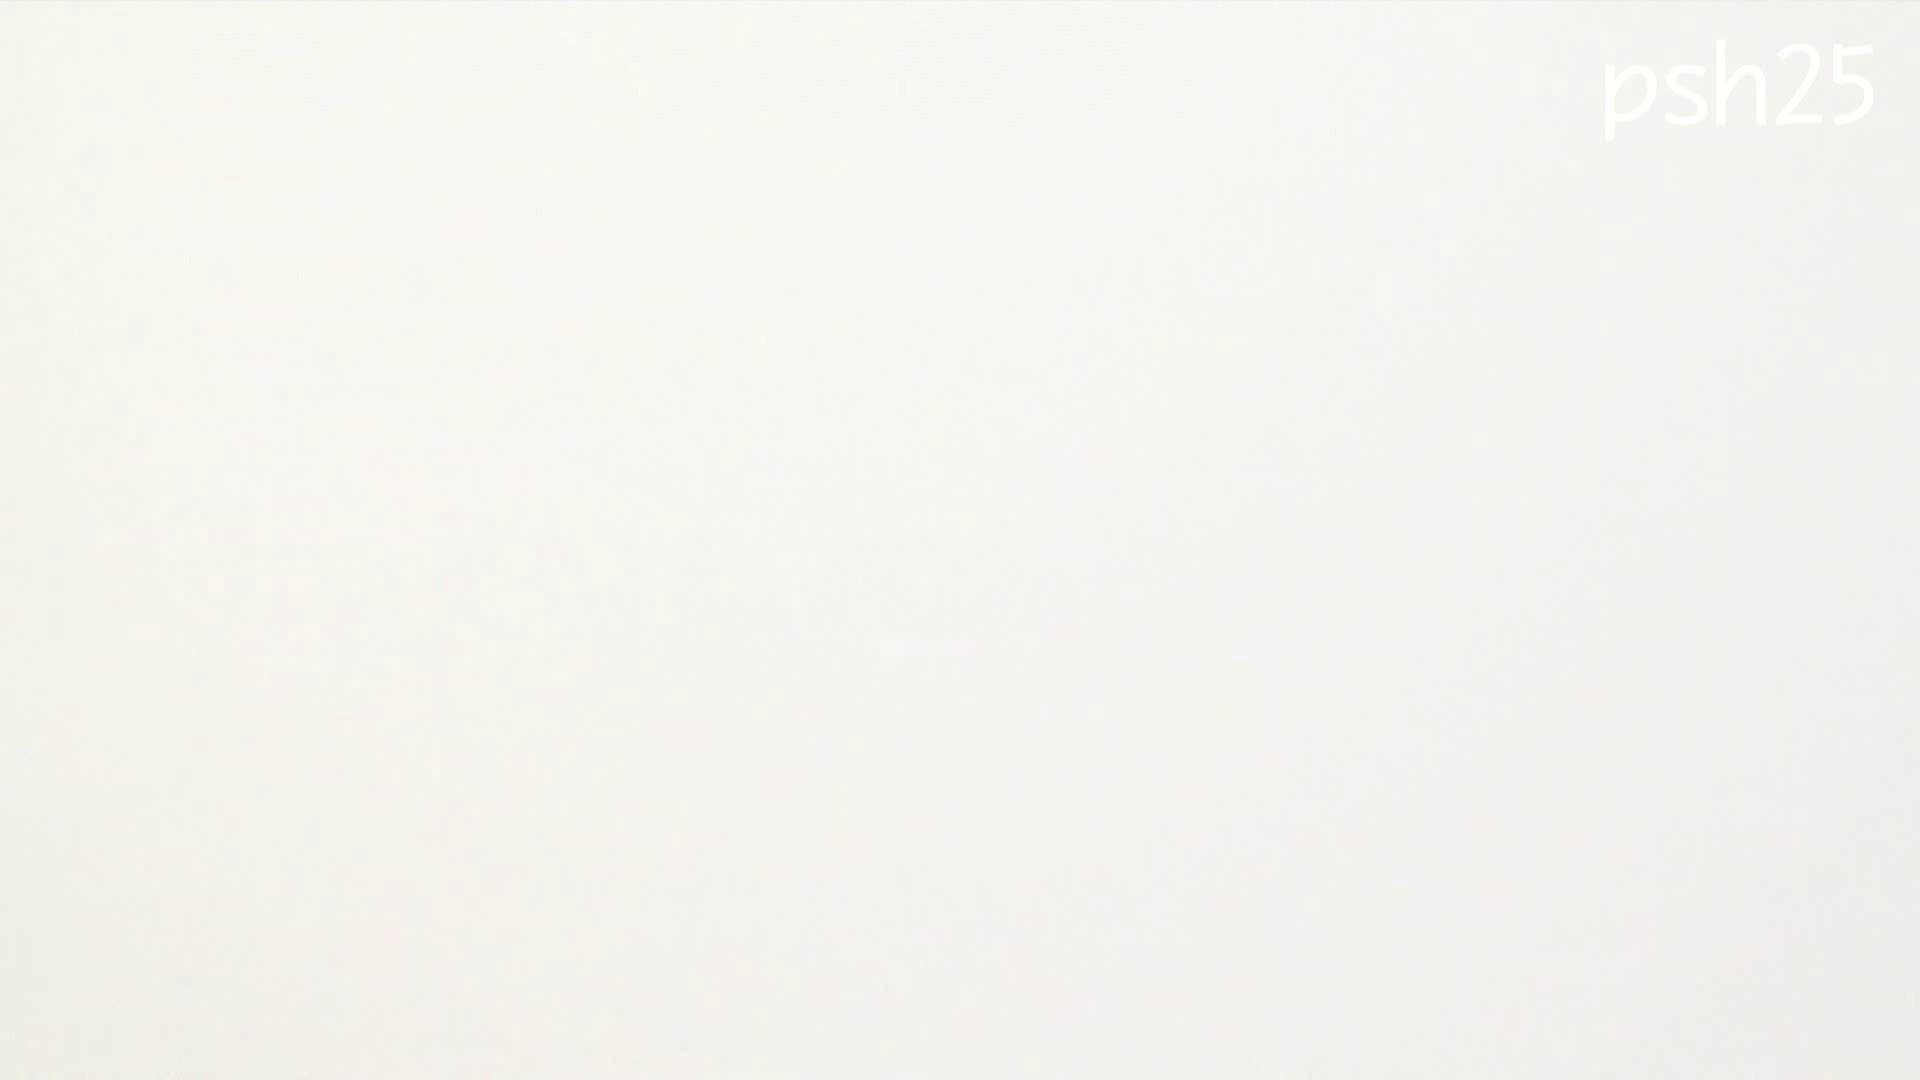 ▲復活限定▲ハイビジョン 盗神伝 Vol.25 盗撮映像大放出  106連発 36